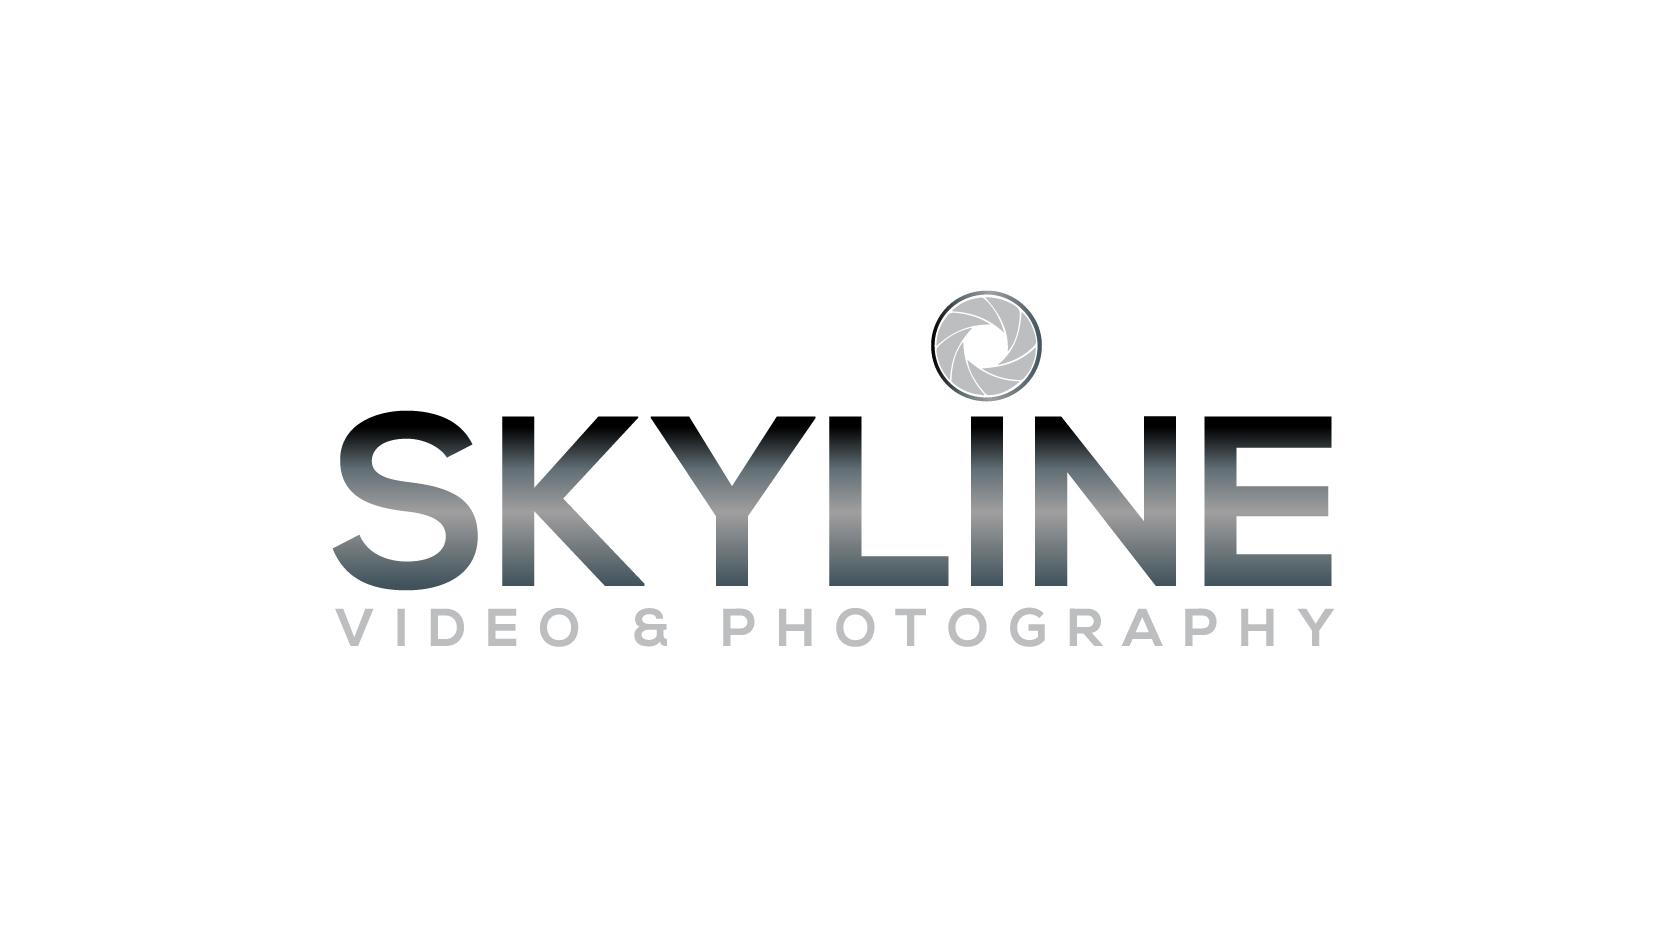 Skyline Video & Photography